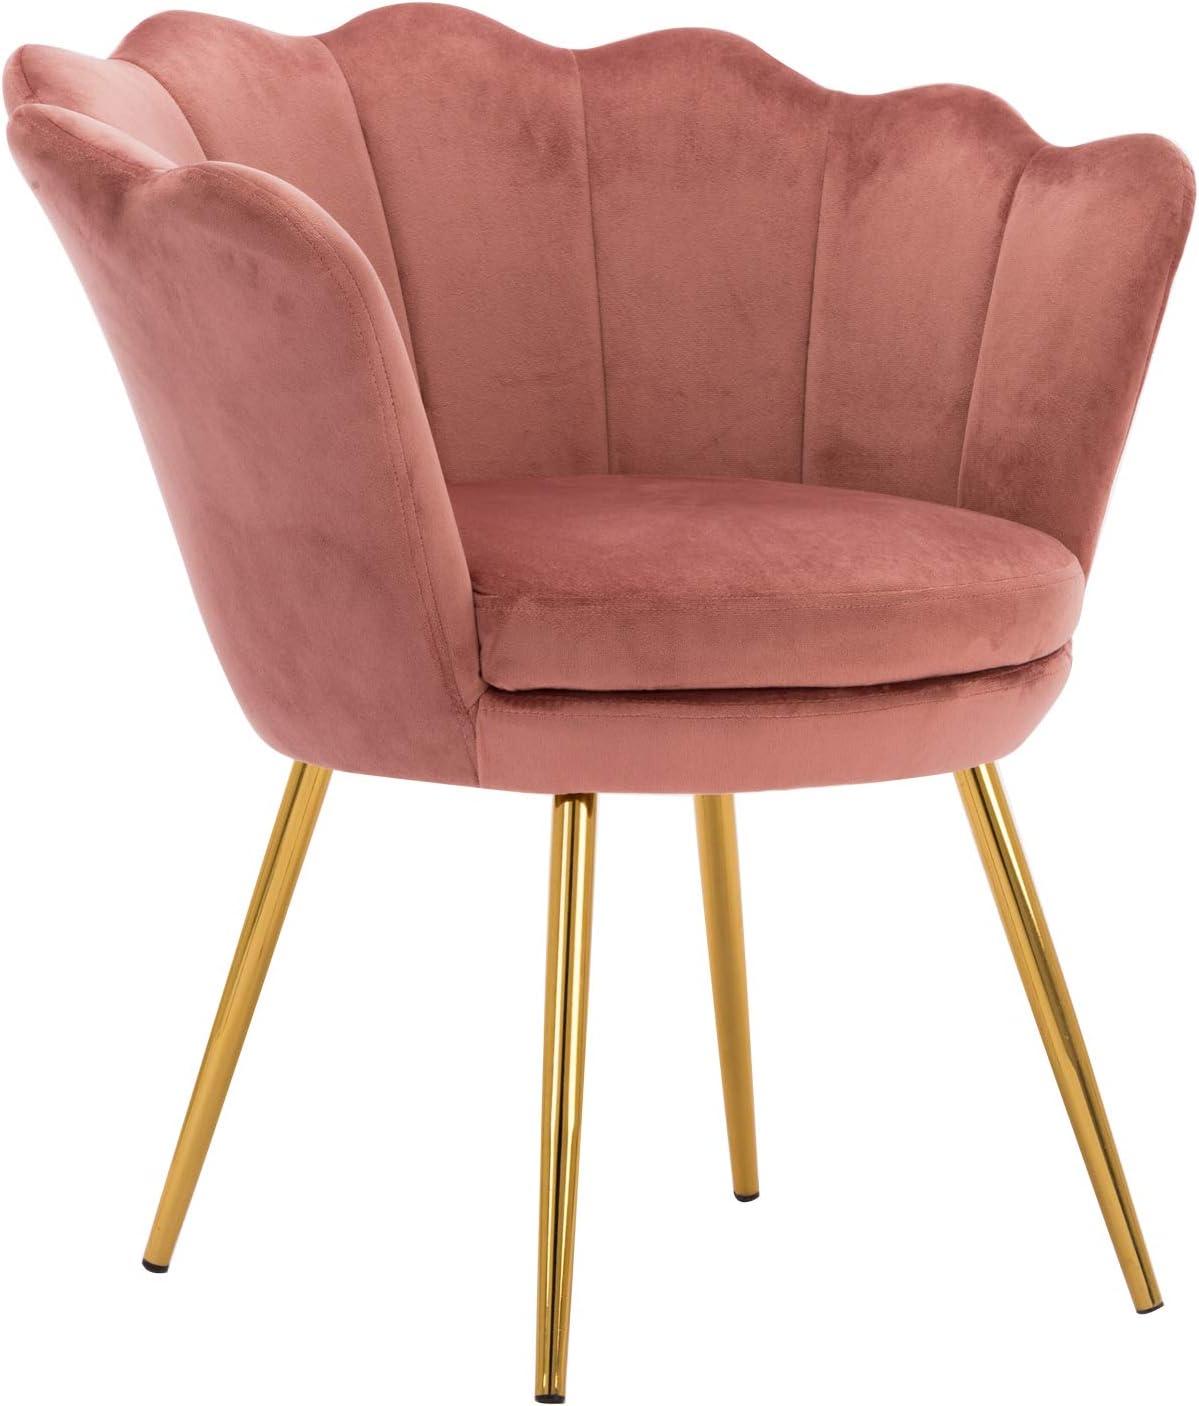 Pink Comfy Desk Chair no Wheels, Velvet Upholstered Accent Chair, Vanity Chair for Living Room, Bedroom, Dining Room, Golden Legs, Pink